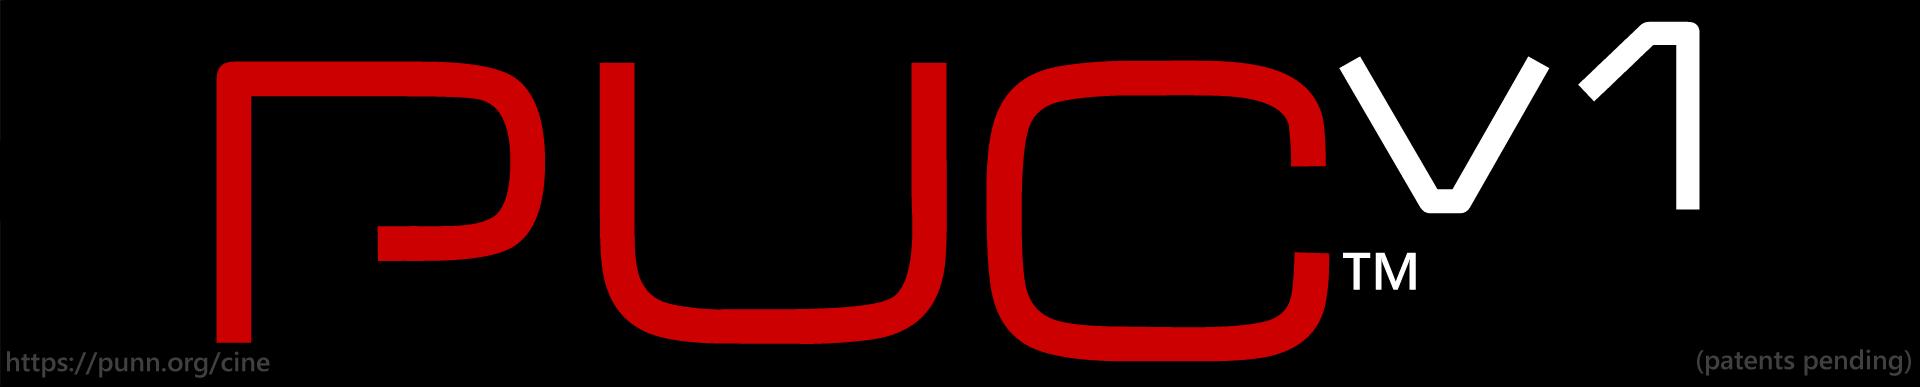 PUC v1